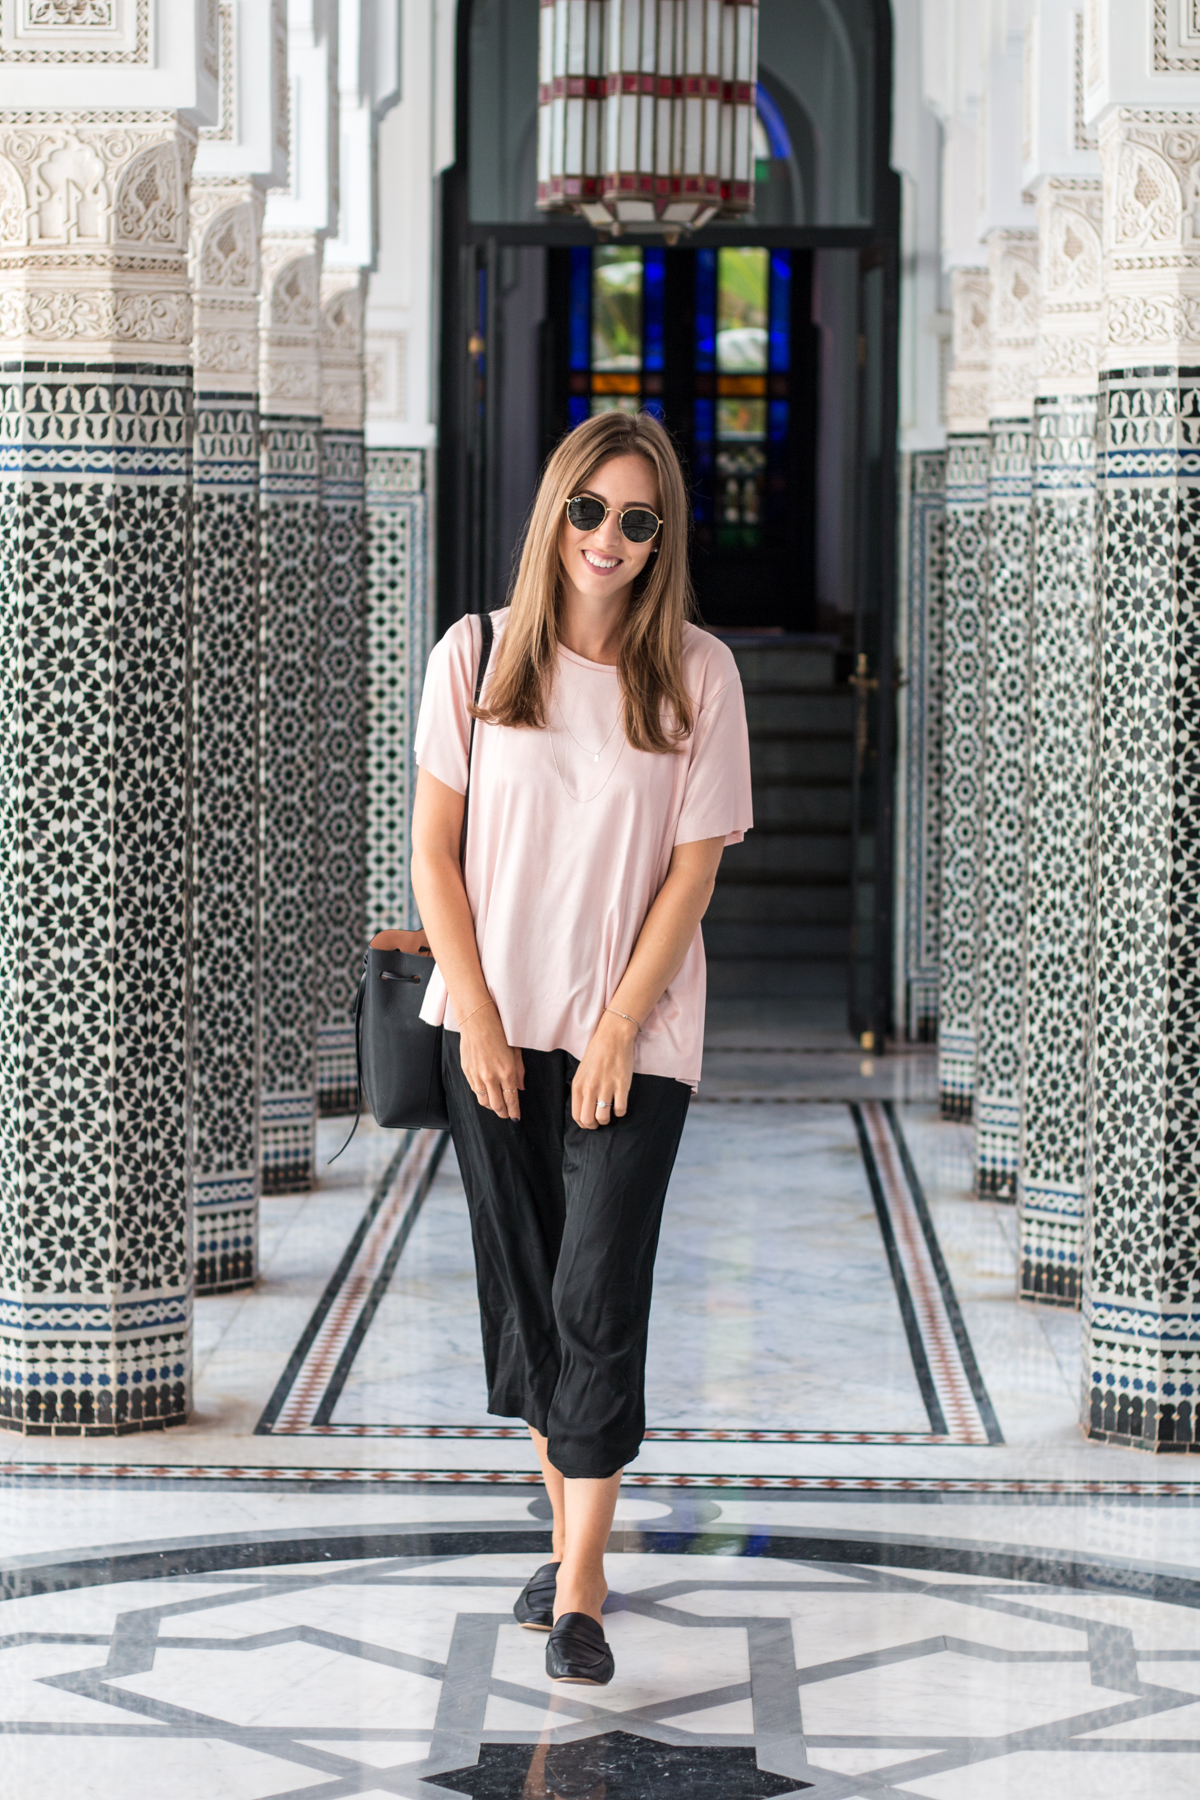 marrakech-travel-diary-207